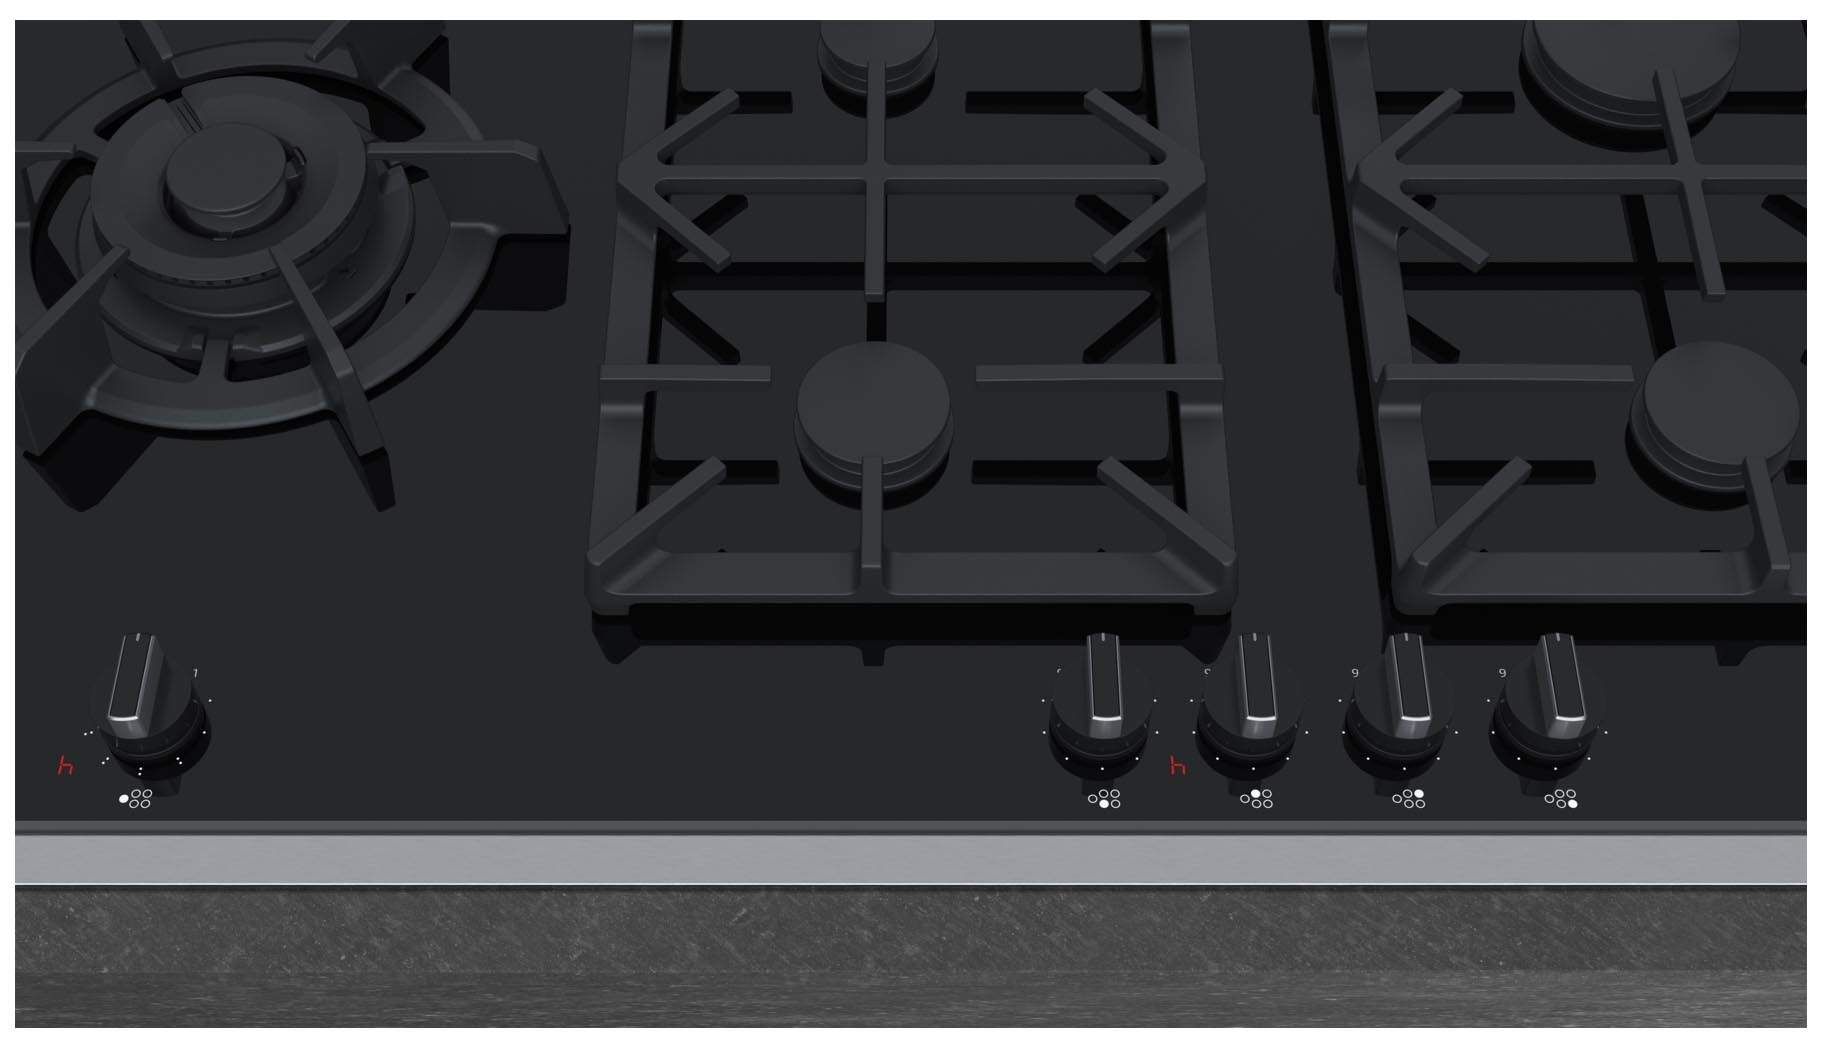 Встраиваемая варочная панель газовая Neff T29TA79N0 Black